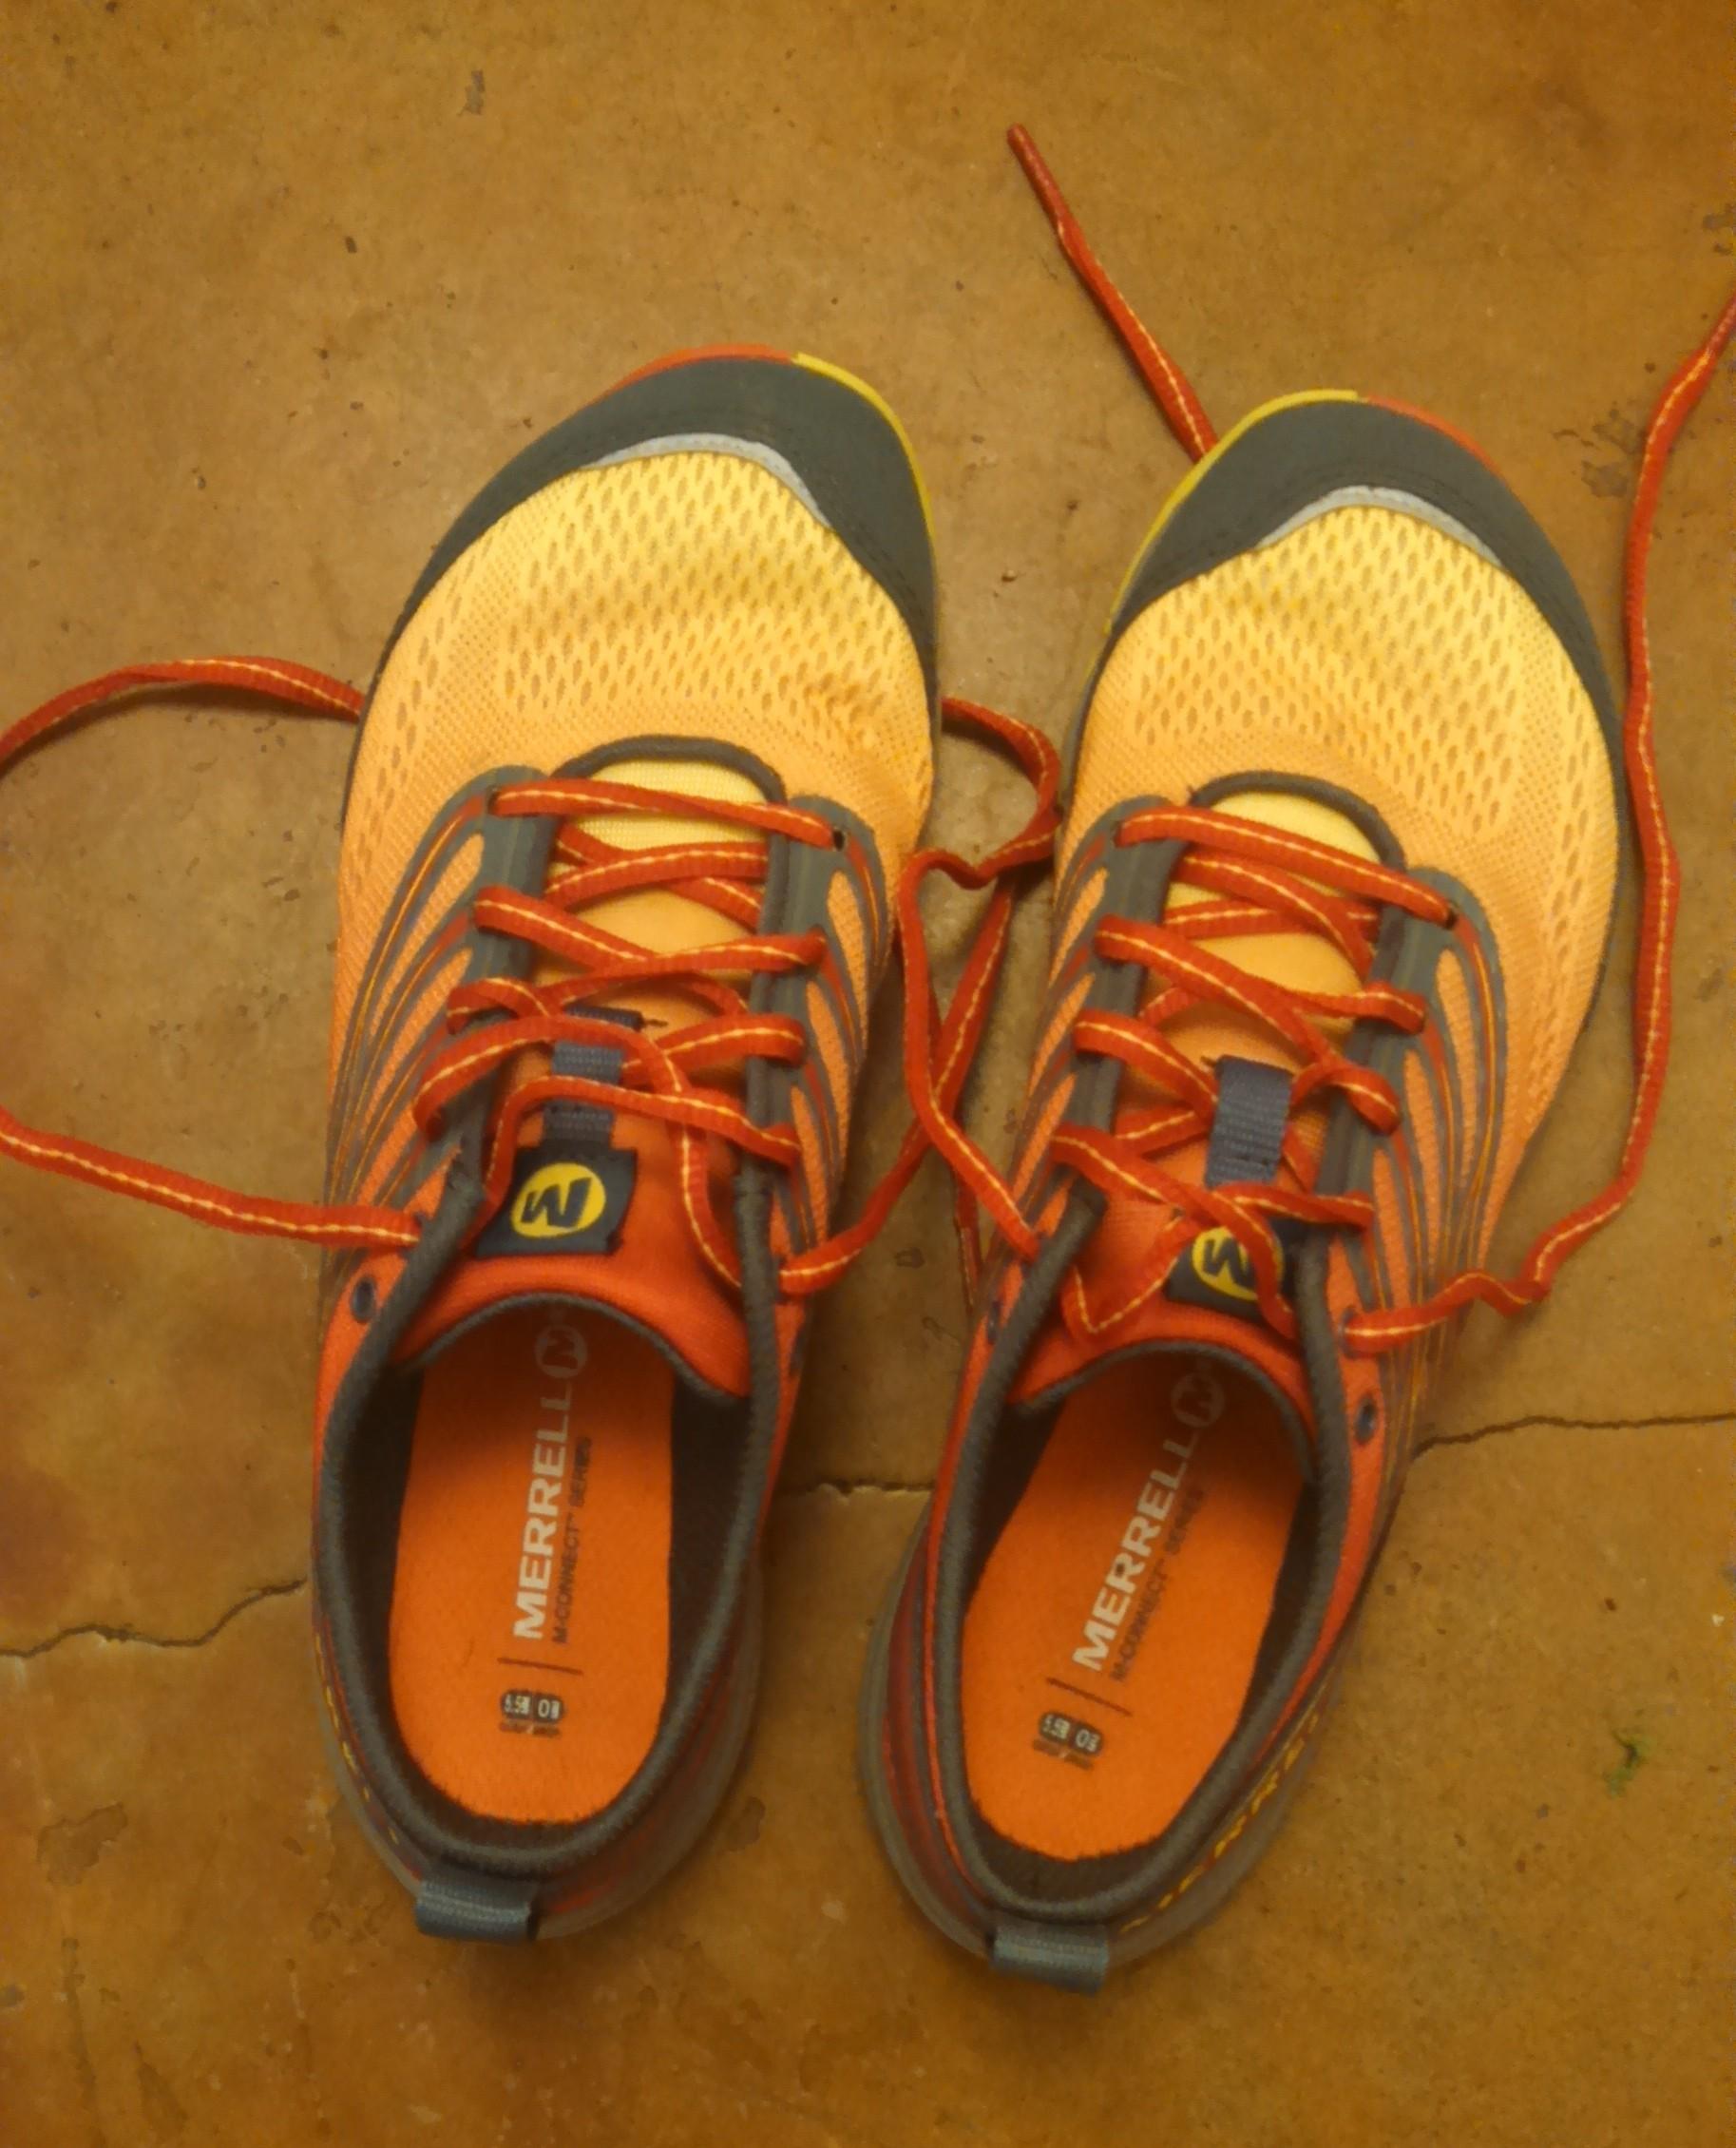 shoes-e1414982697354.jpg